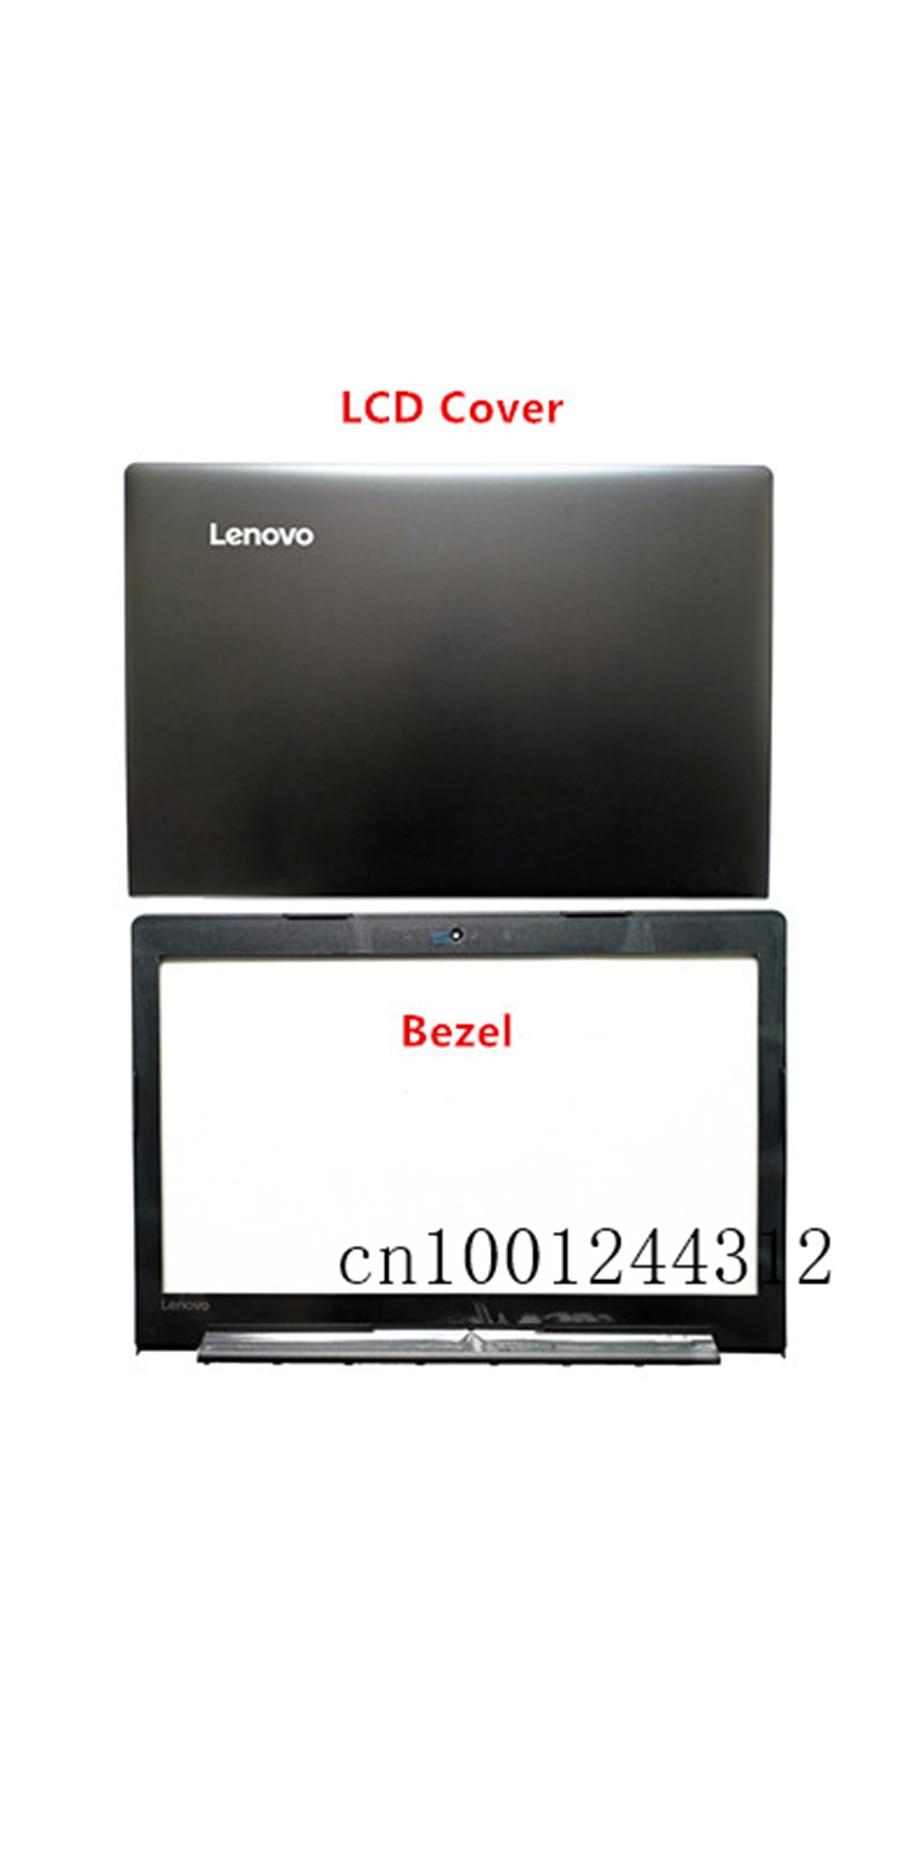 New Original For Lenovo Ideapad 310-15 310-15IKB 310-15ISK LCD Rear Top Lid Back Cover W/Antenna  /Bezel 5CB0L35899 5b30L35928